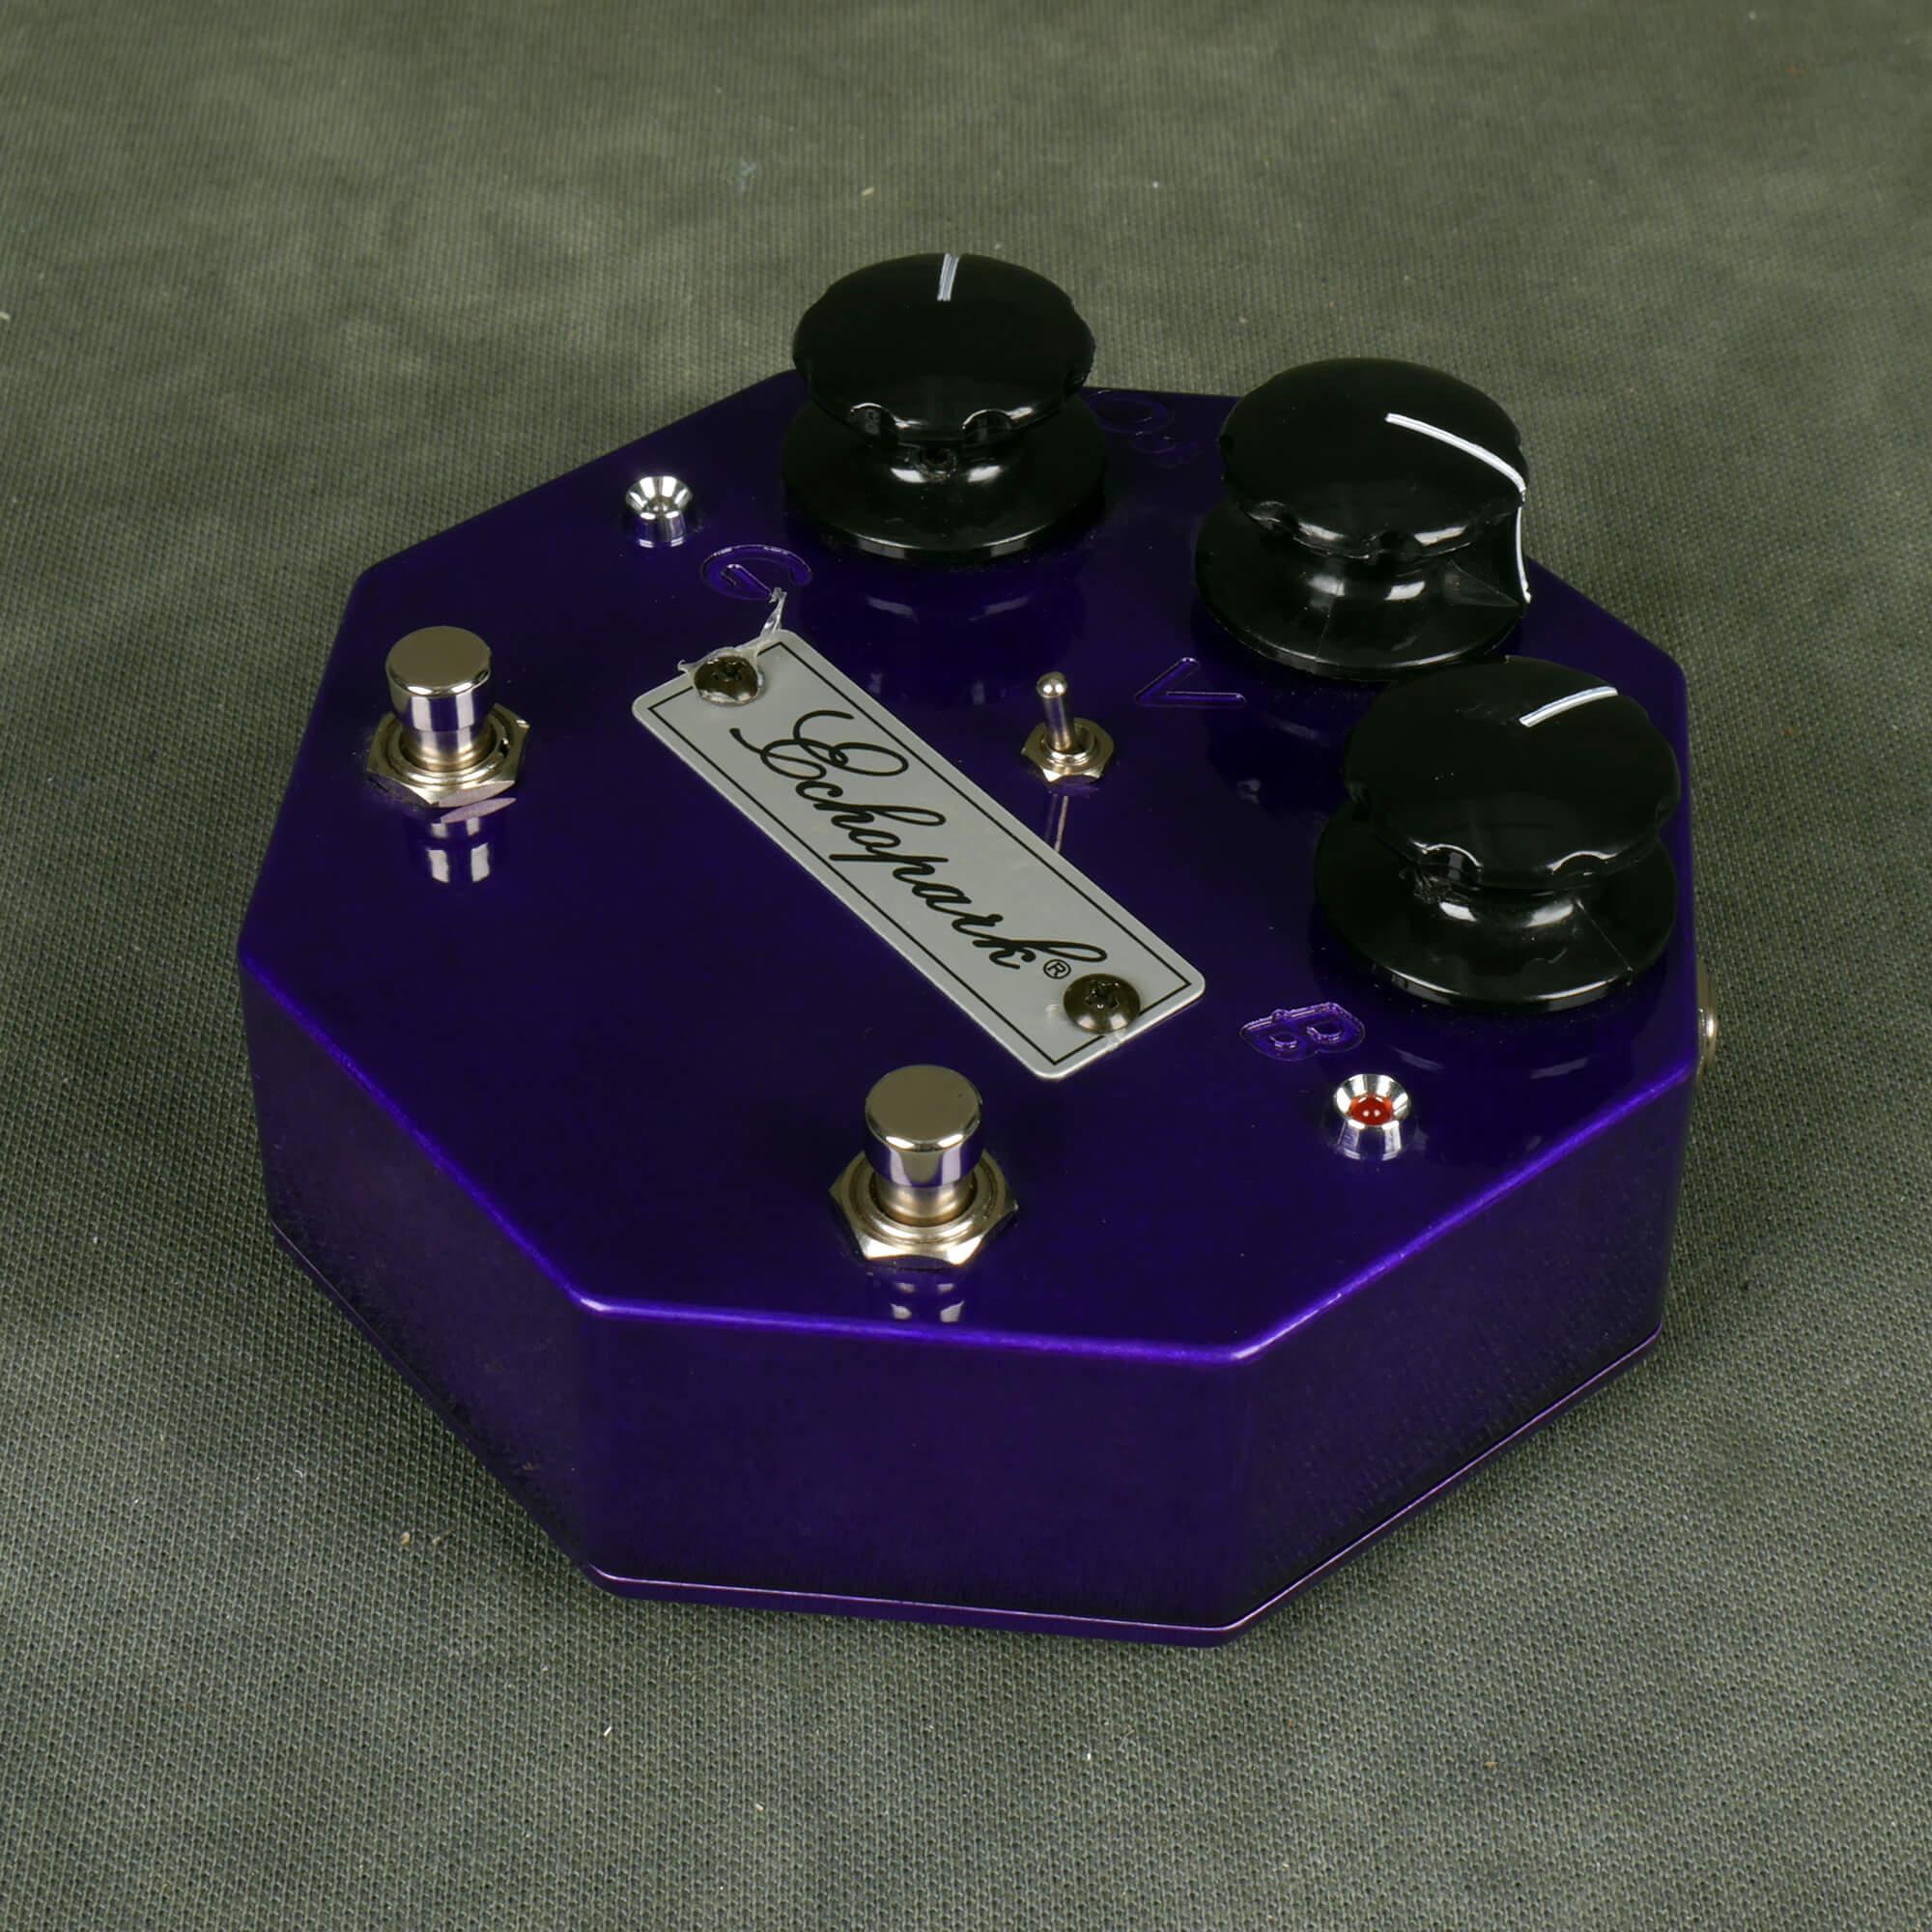 Echopark F-3 Chronic Fuzz Purple FX Pedal - 2nd Hand